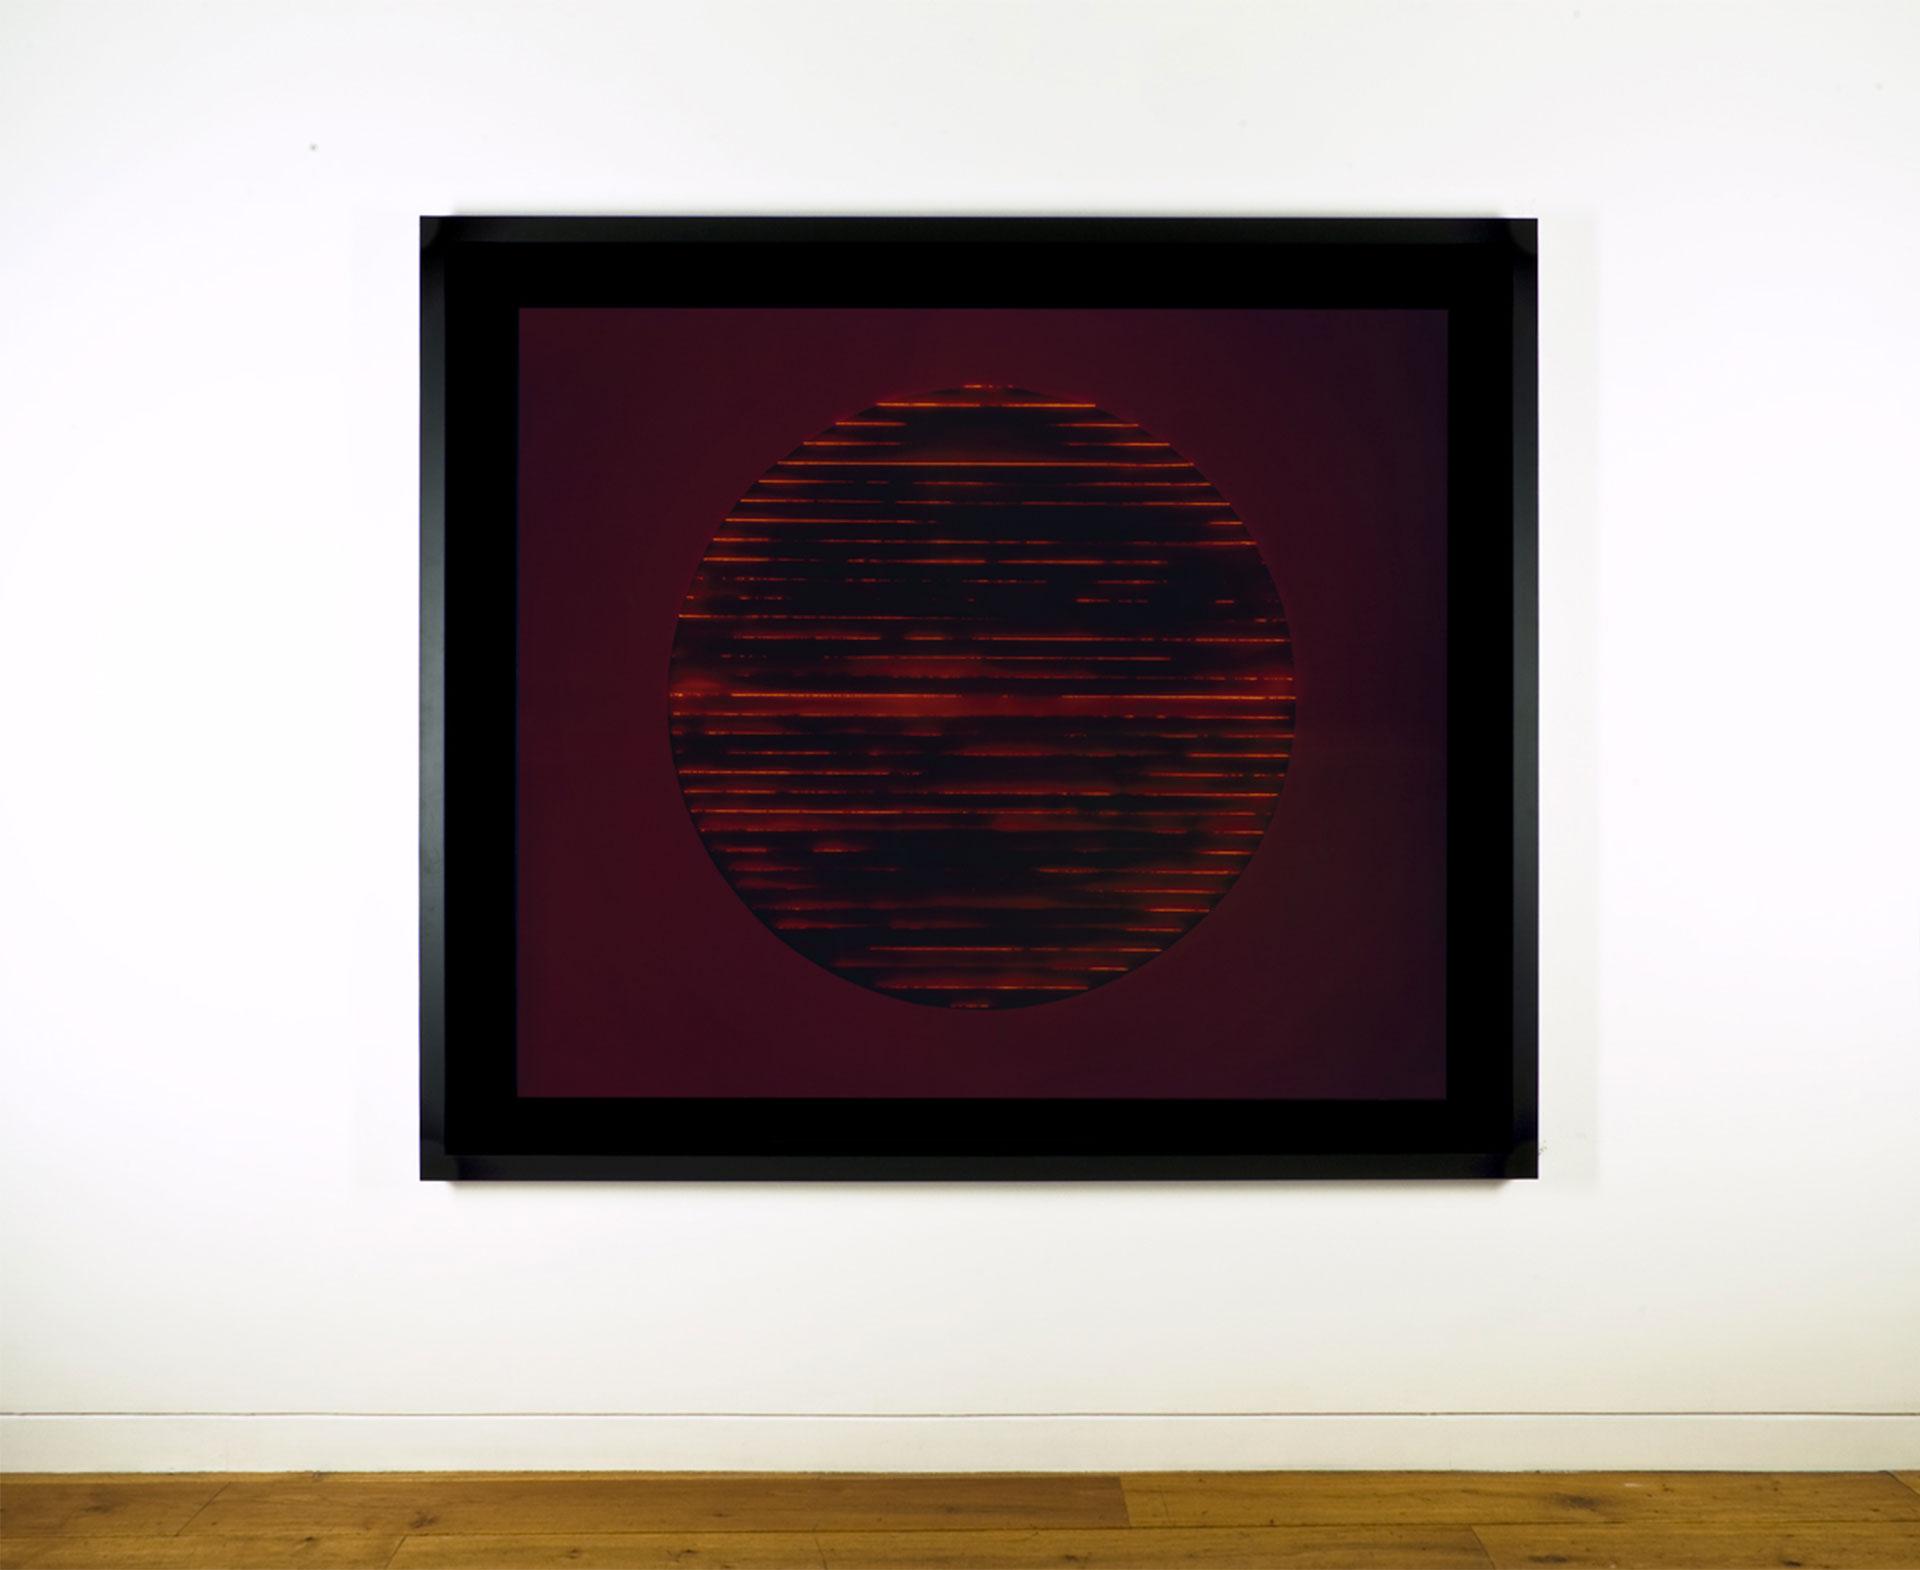 03_Galerie-Gimpel-et-Muller